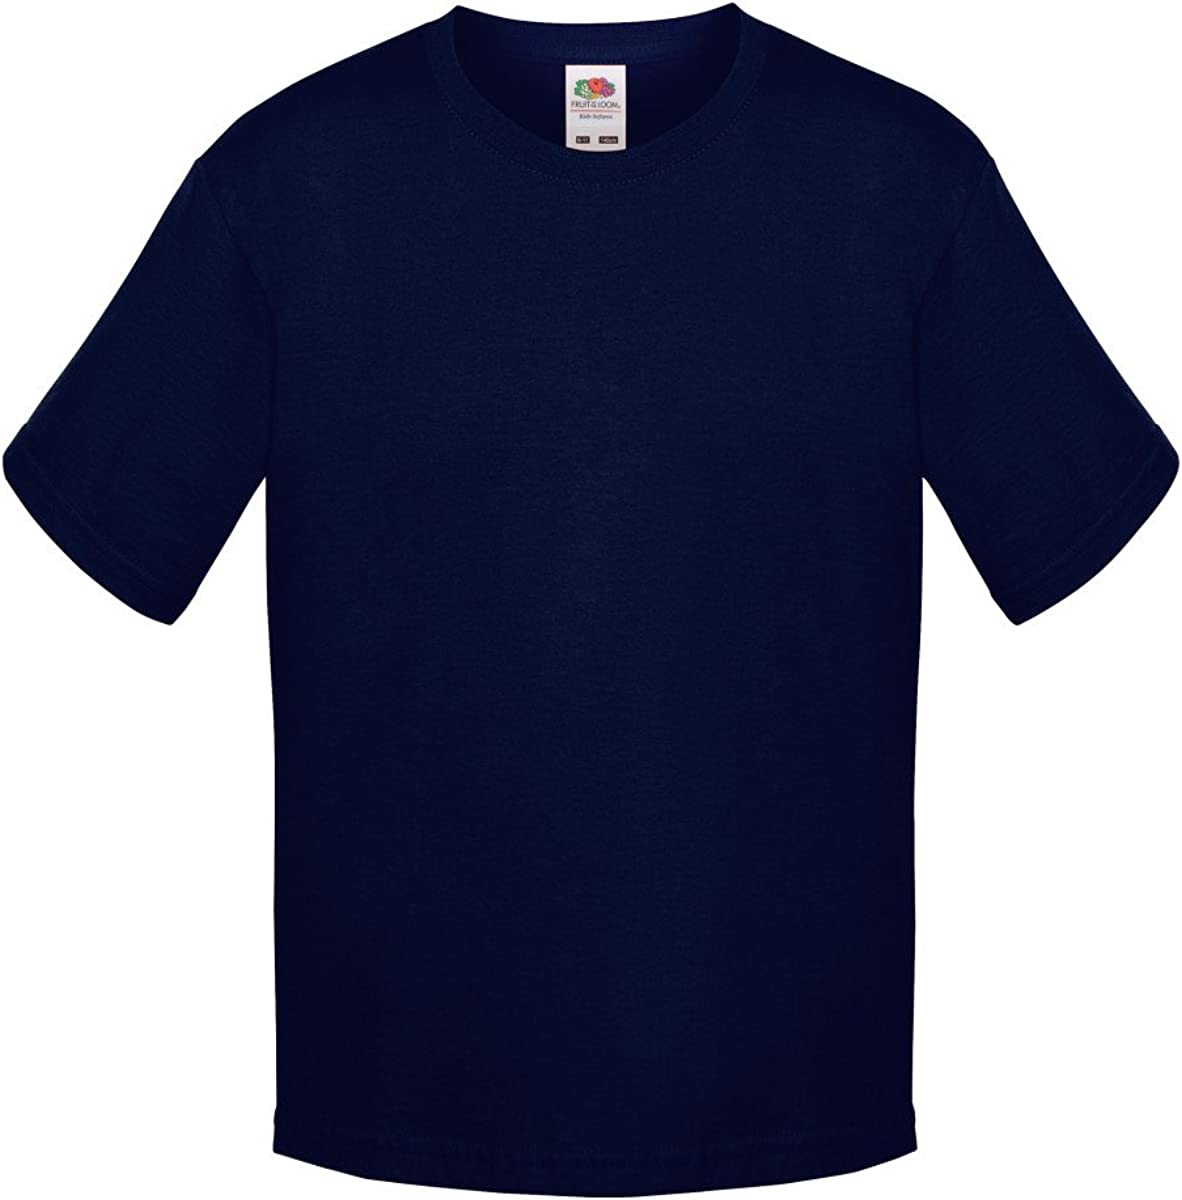 Fruit Of The Loom Kids Sofspun T-Shirt